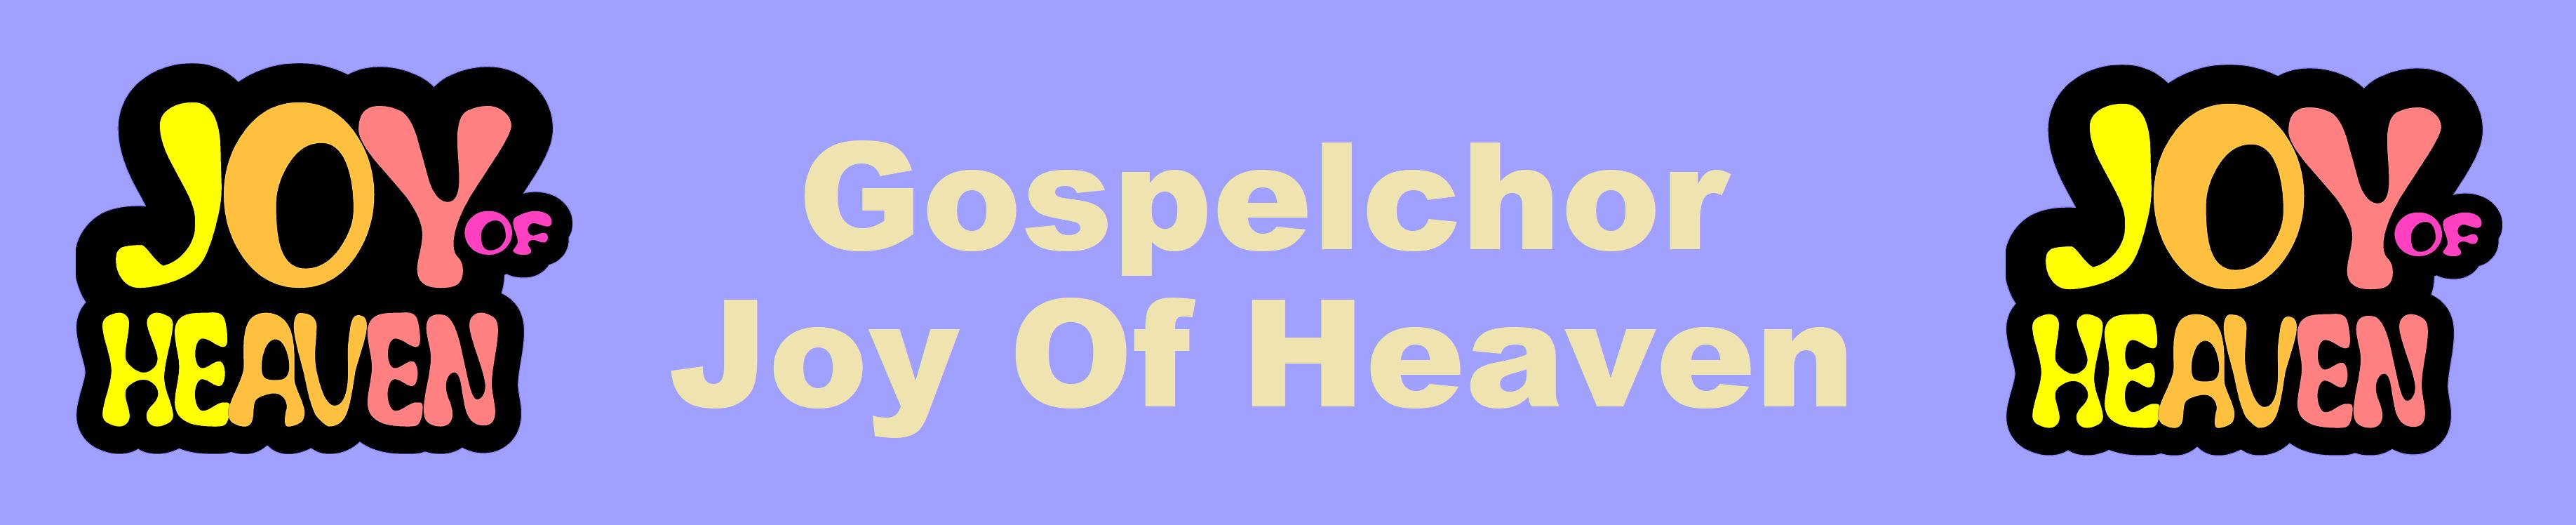 Gospelchor Joy Of Heaven